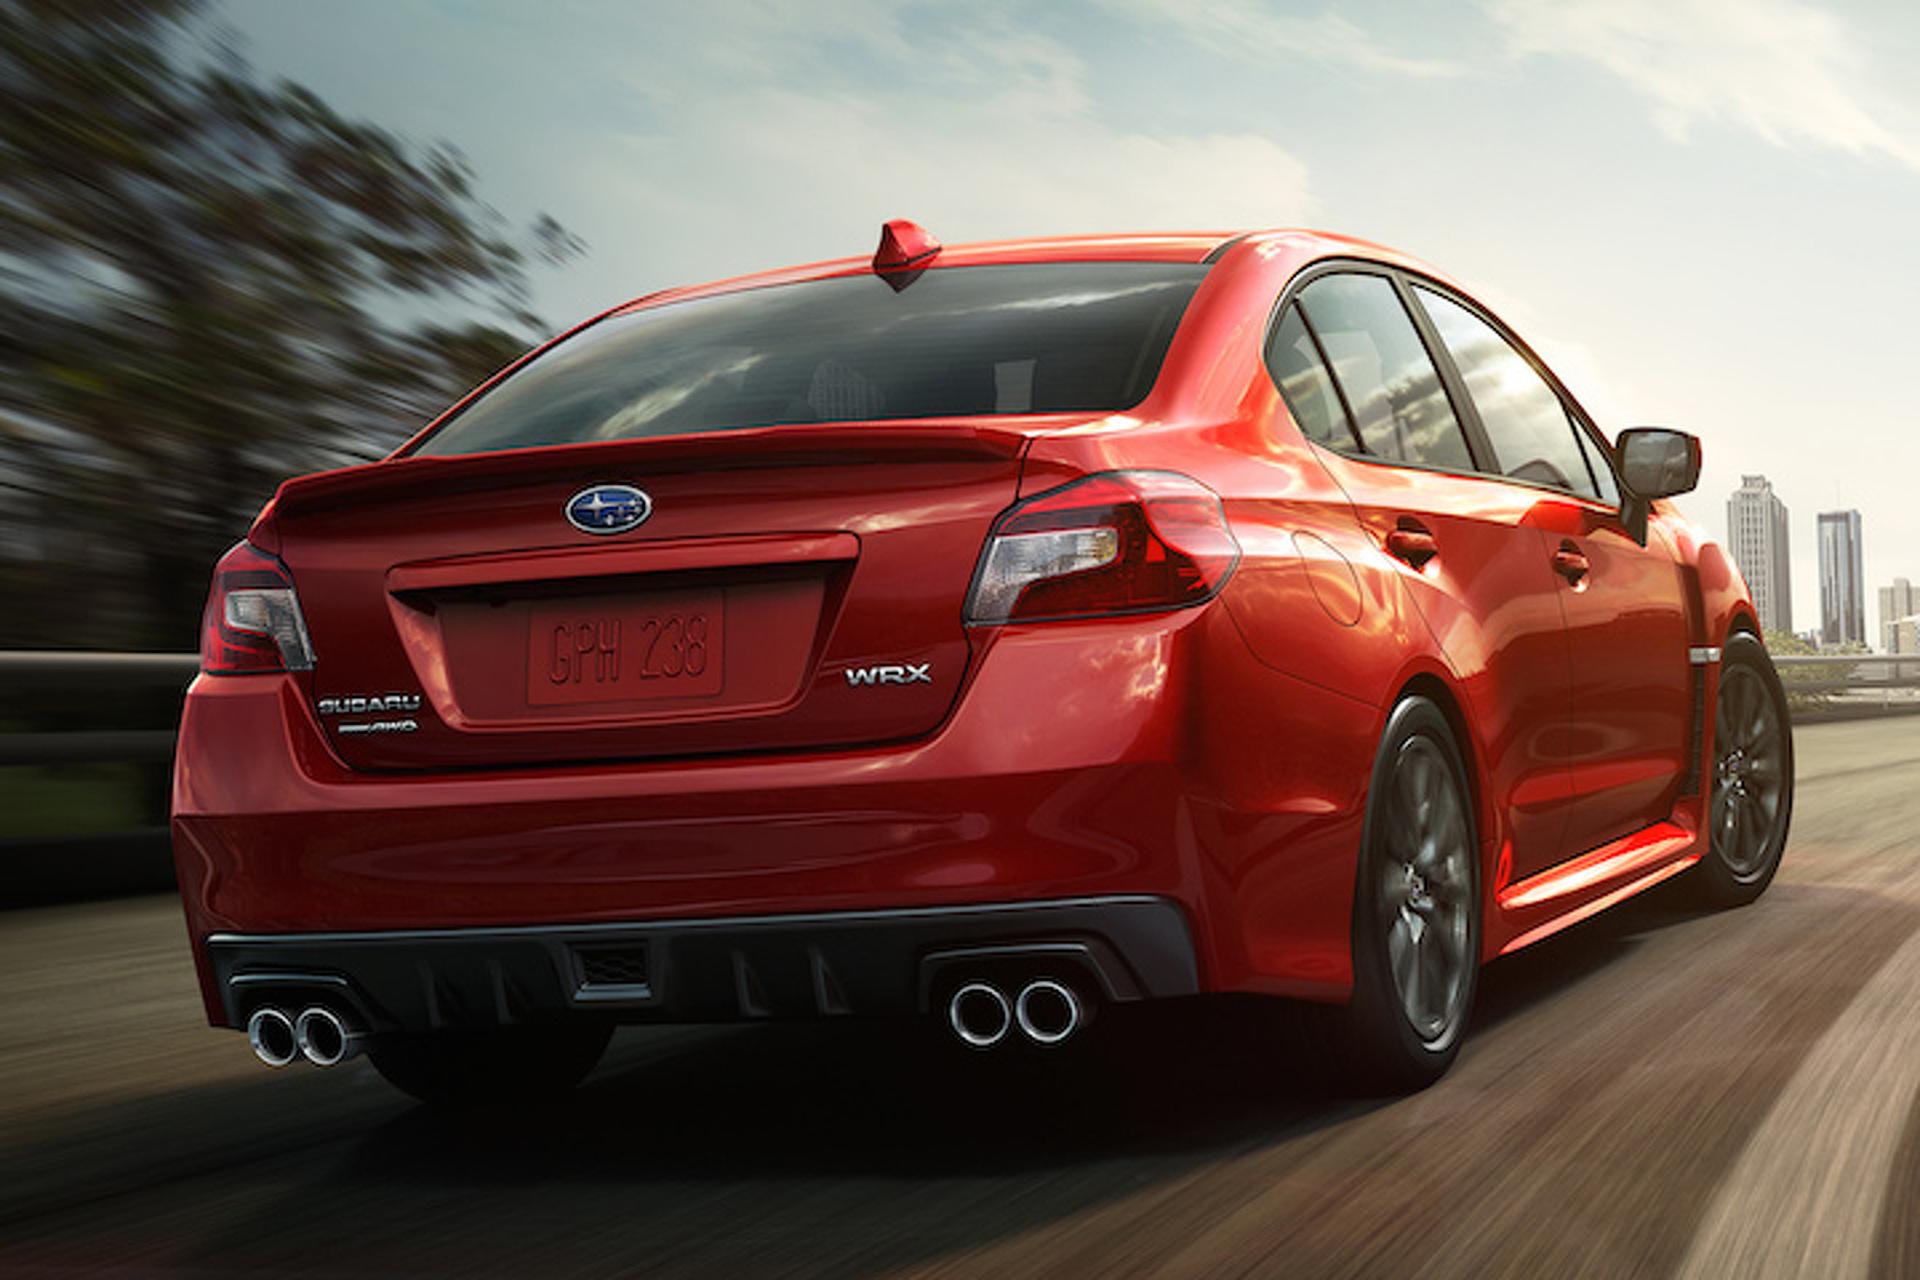 Subaru Building a WRX Hatchback After All?